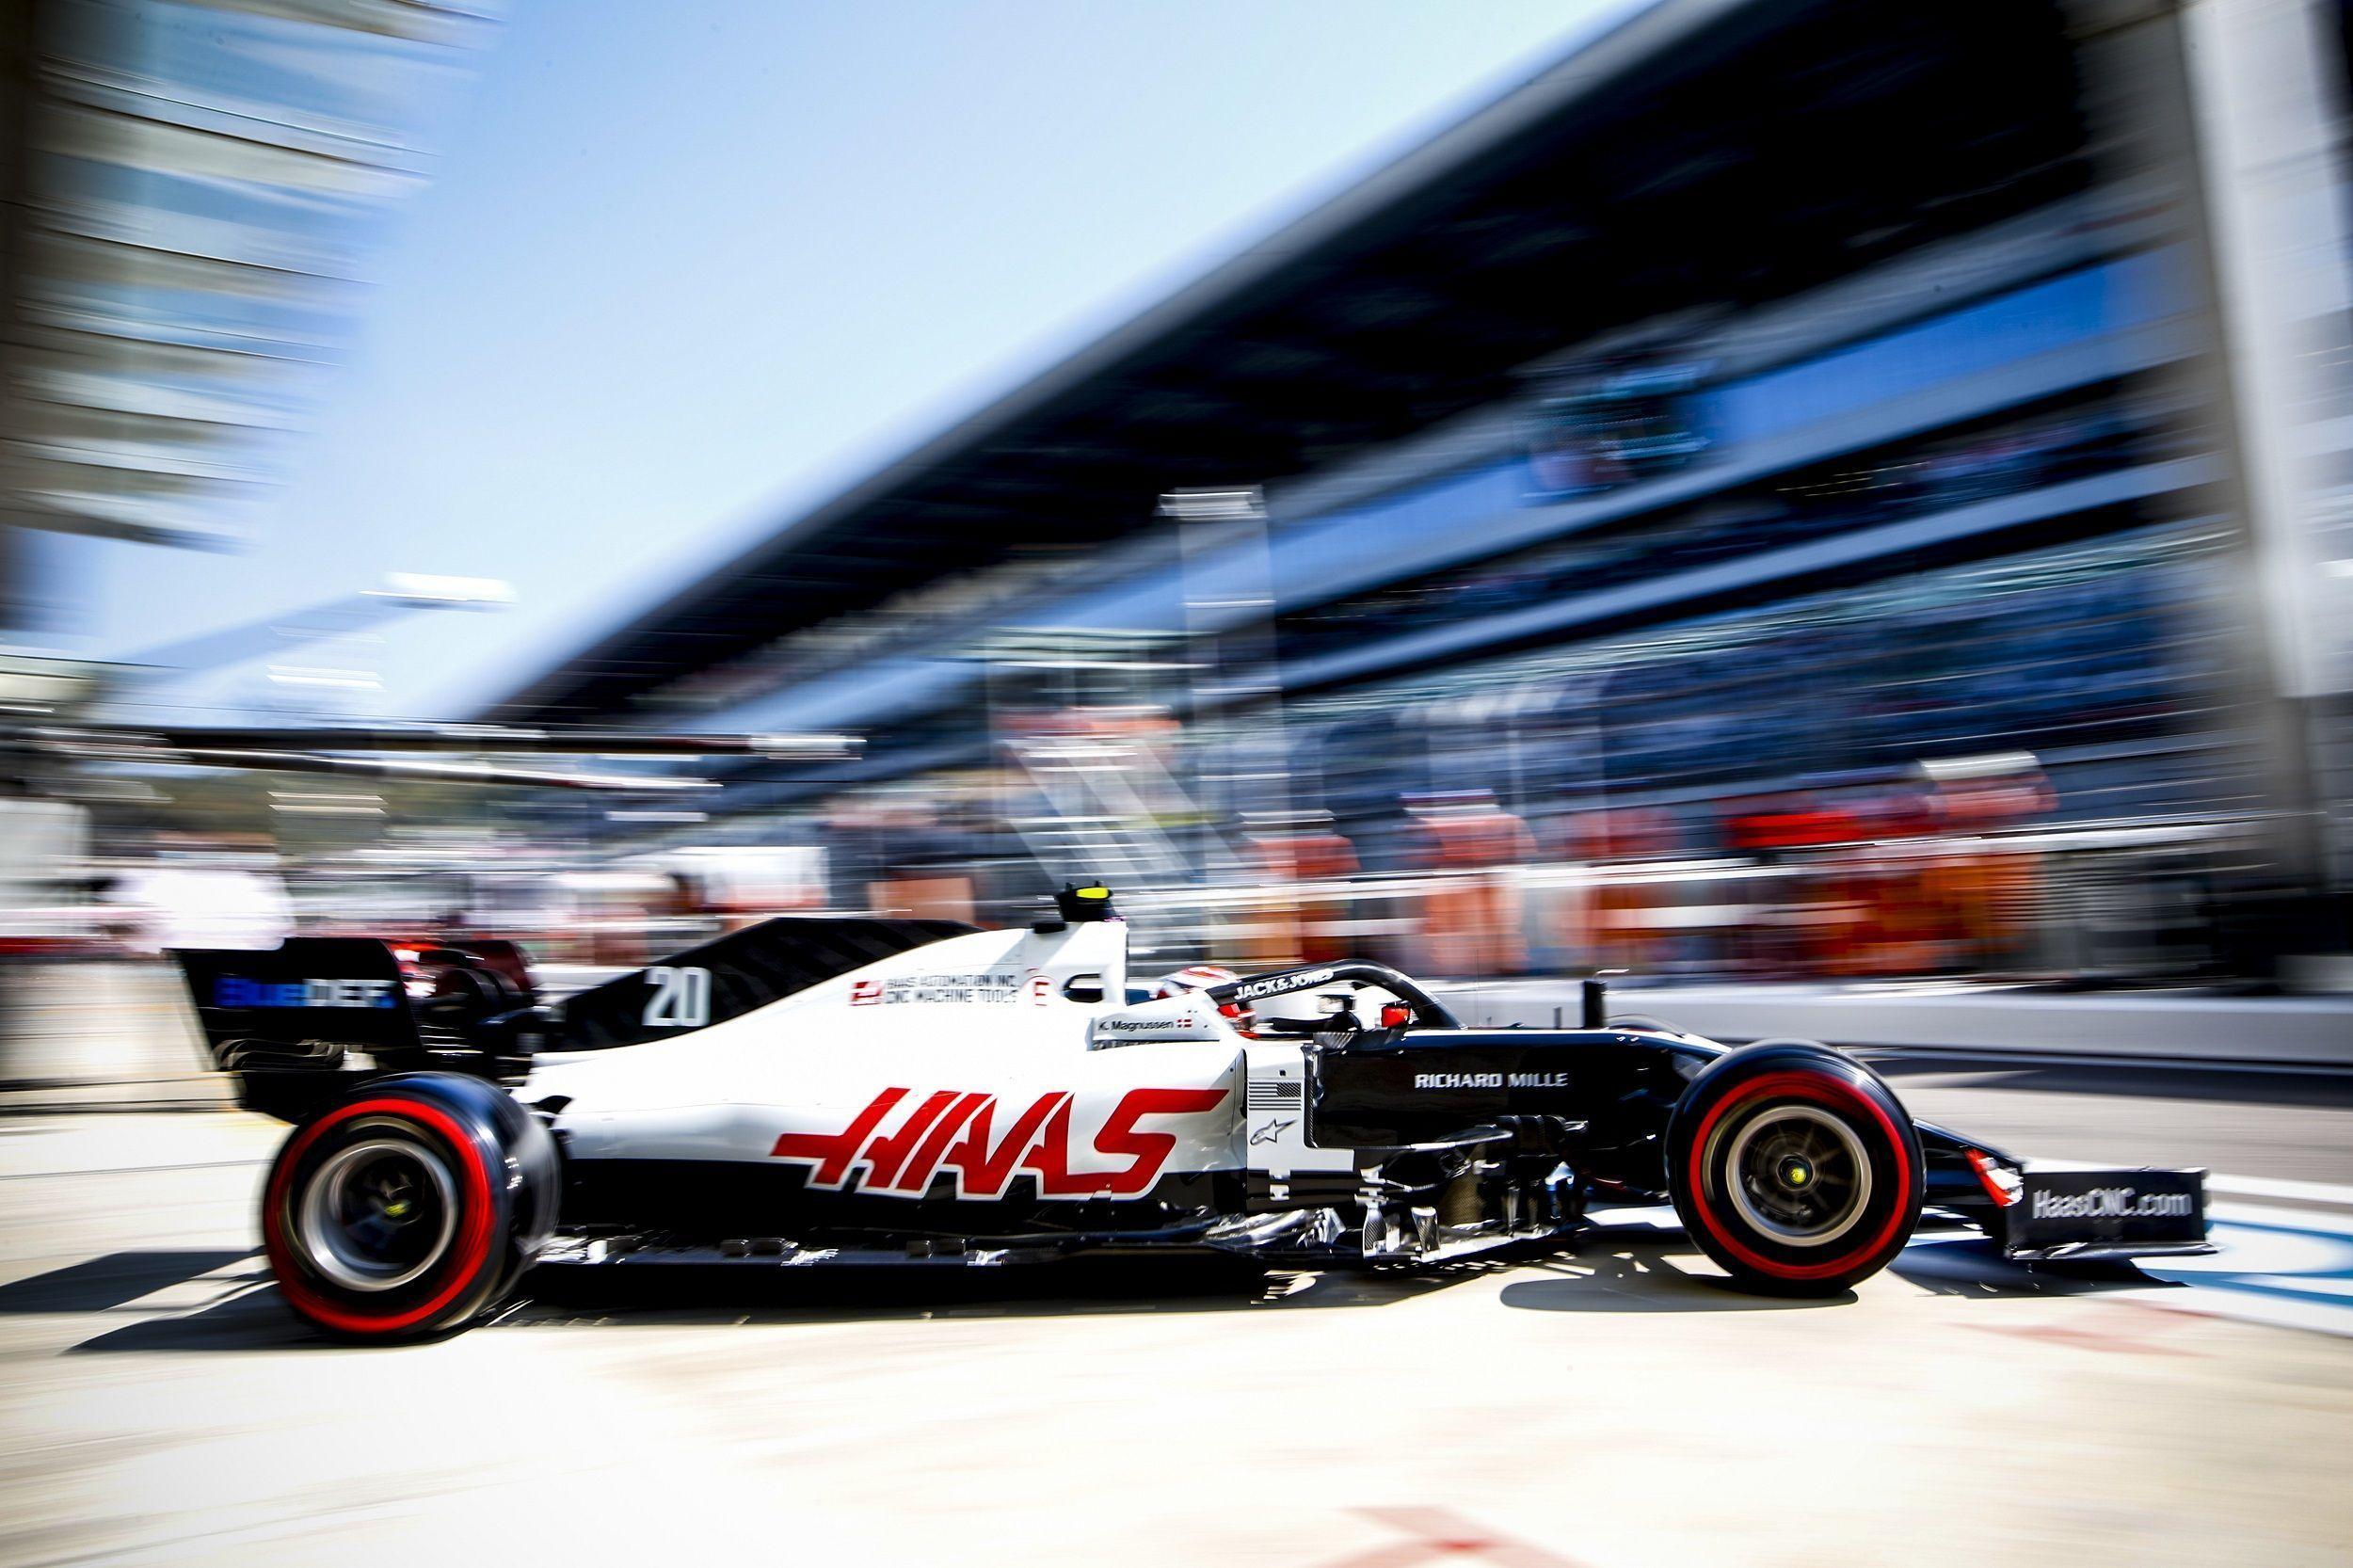 Haas, Guenther Steiner, F1, Romain Grosjean, Kimi Raikkonen